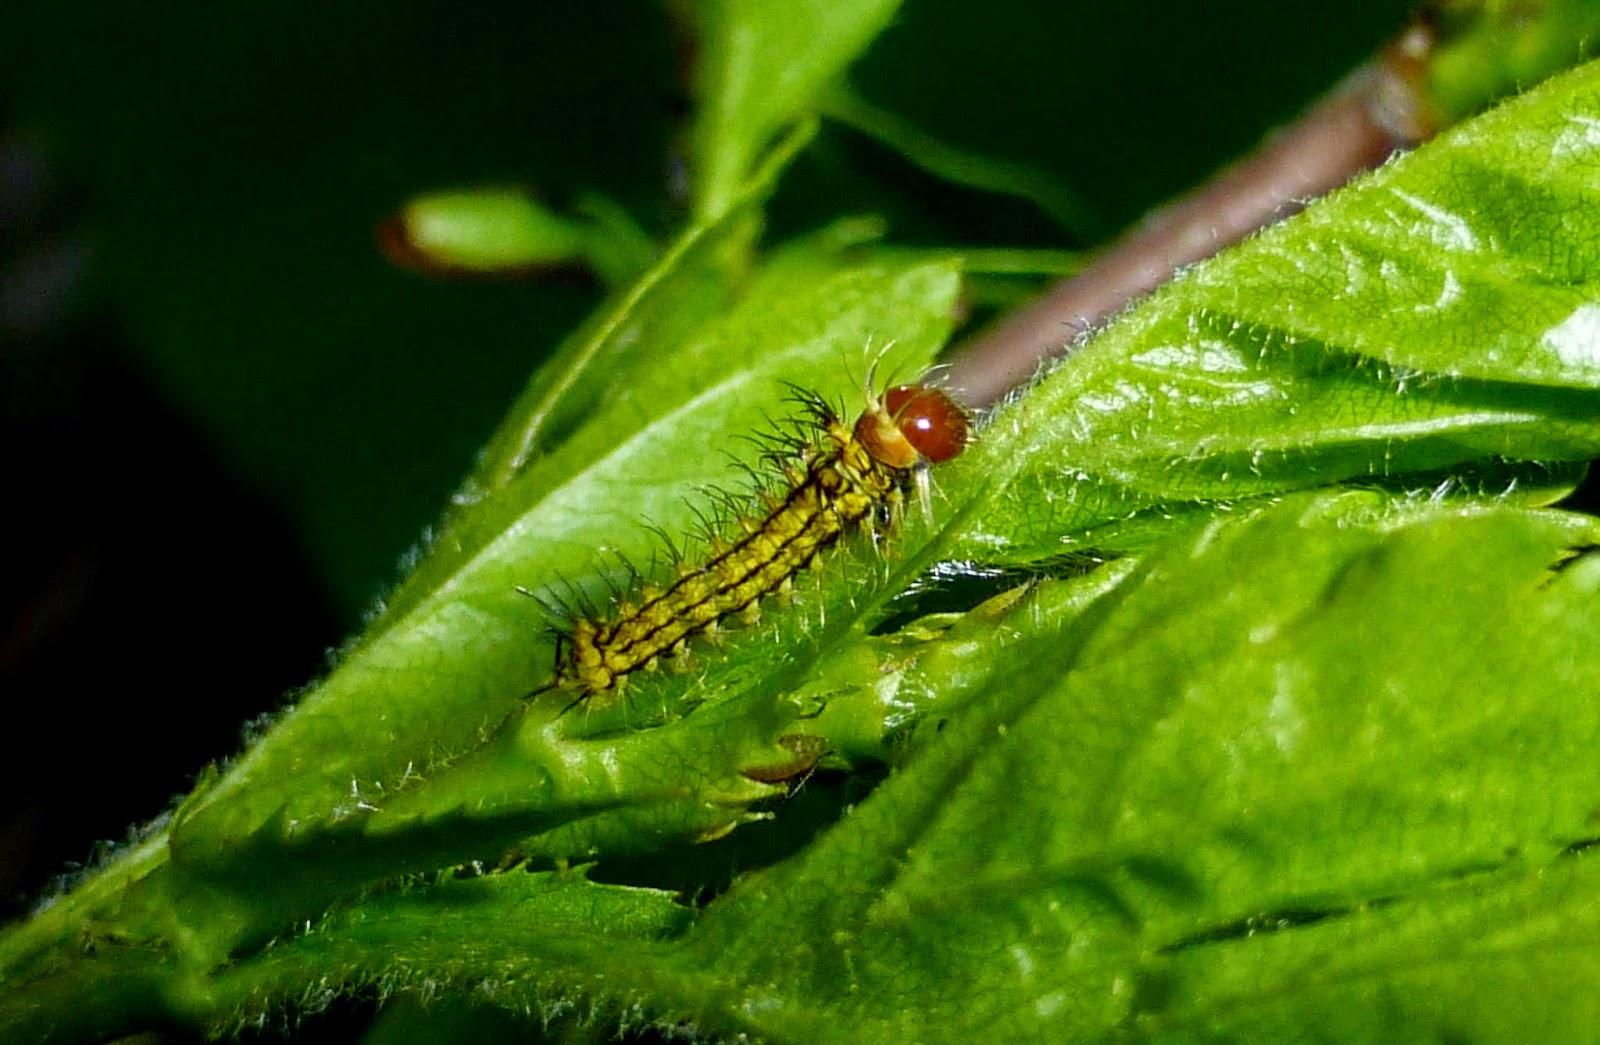 Antheraea yamamai caterpillar